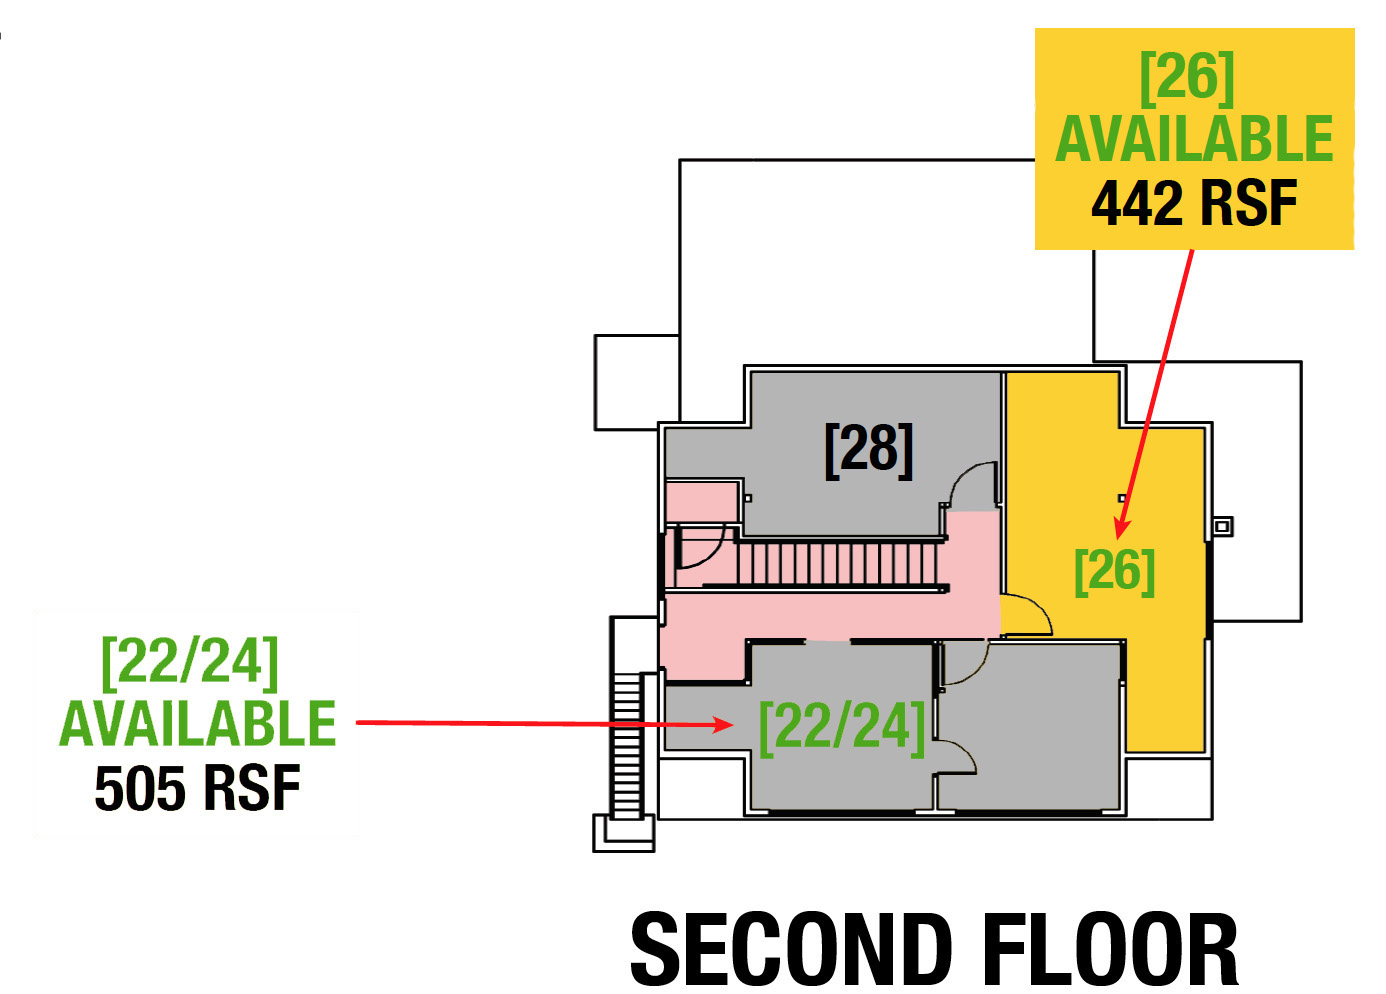 SUITE 134 - 2,636 SF